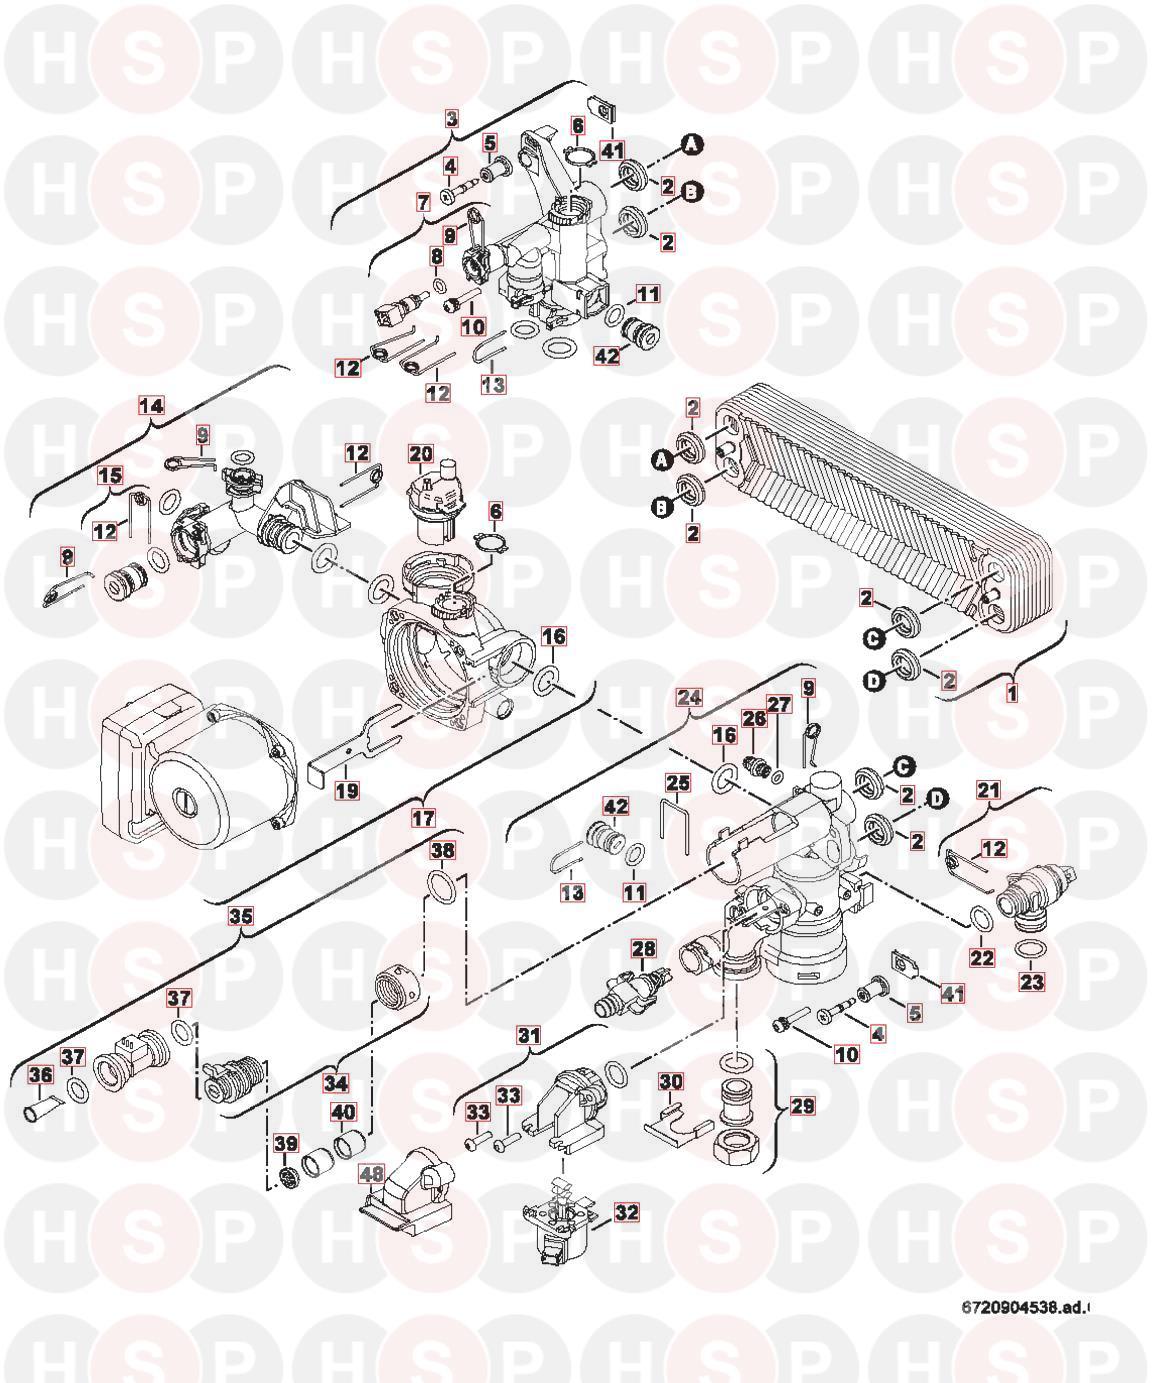 Worcester Greenstar 42cdi Classic Erp Appliance Diagram